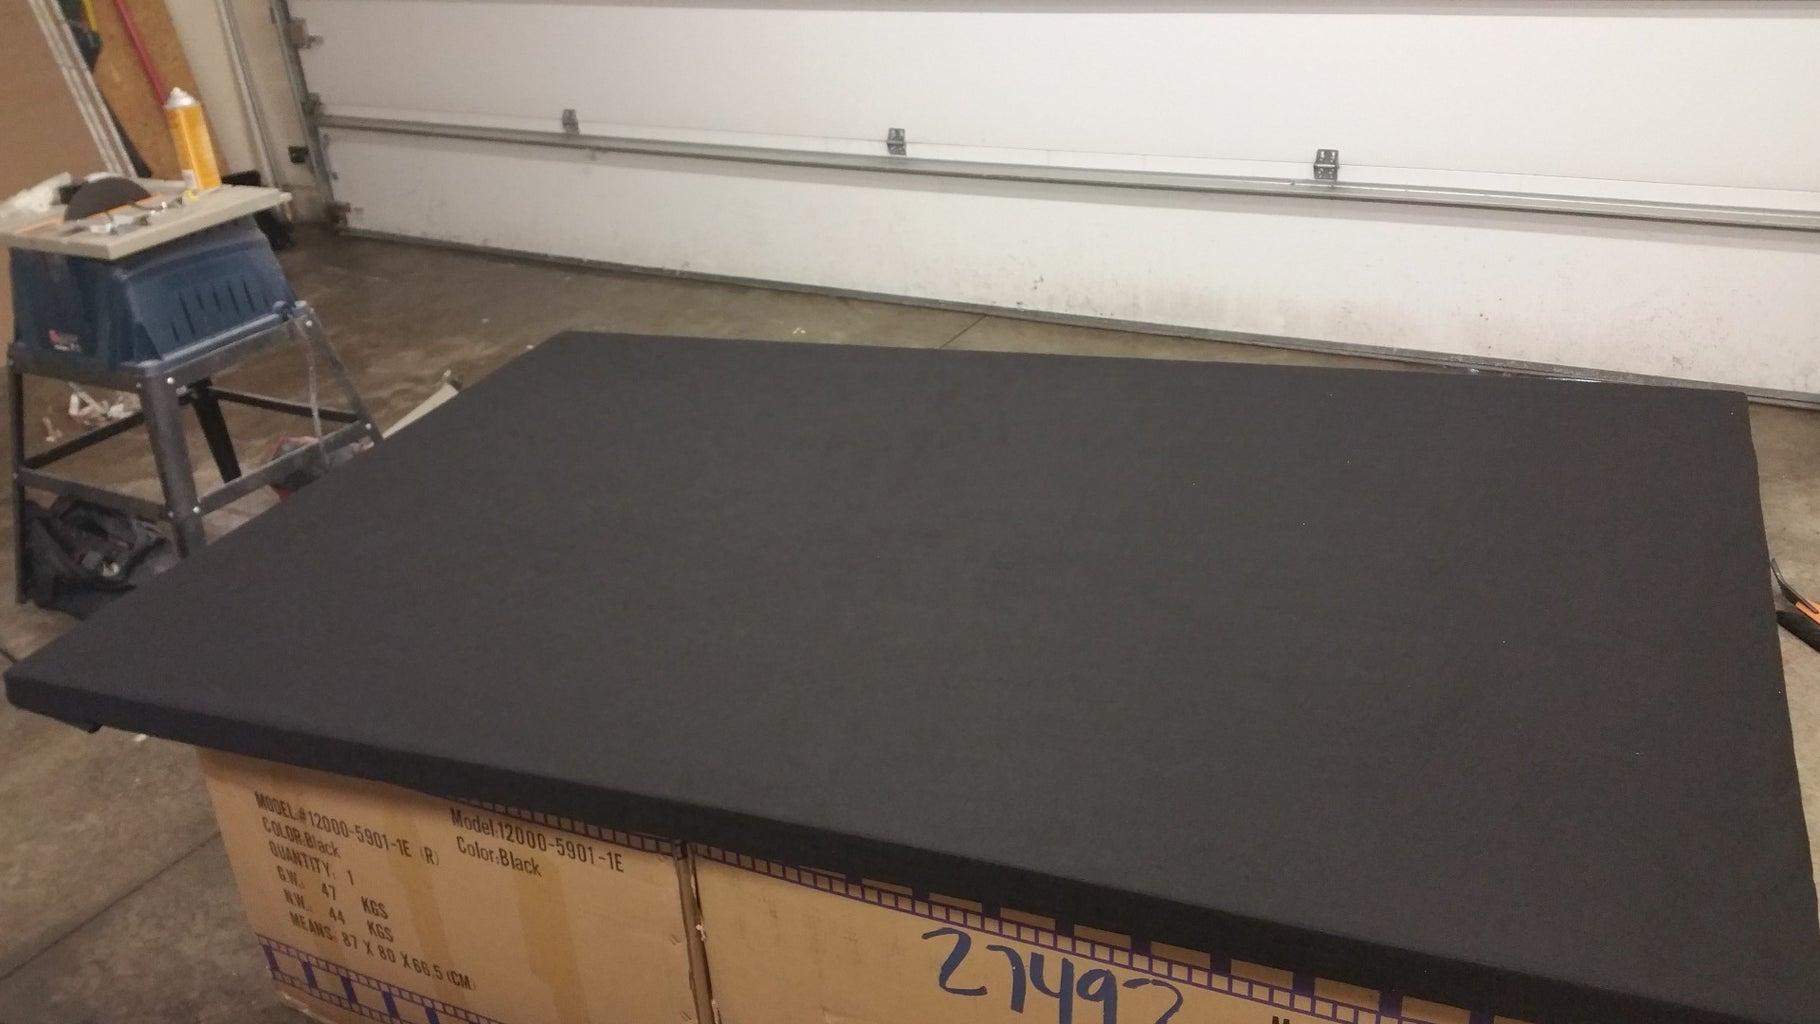 Wrap the Panels With Felt